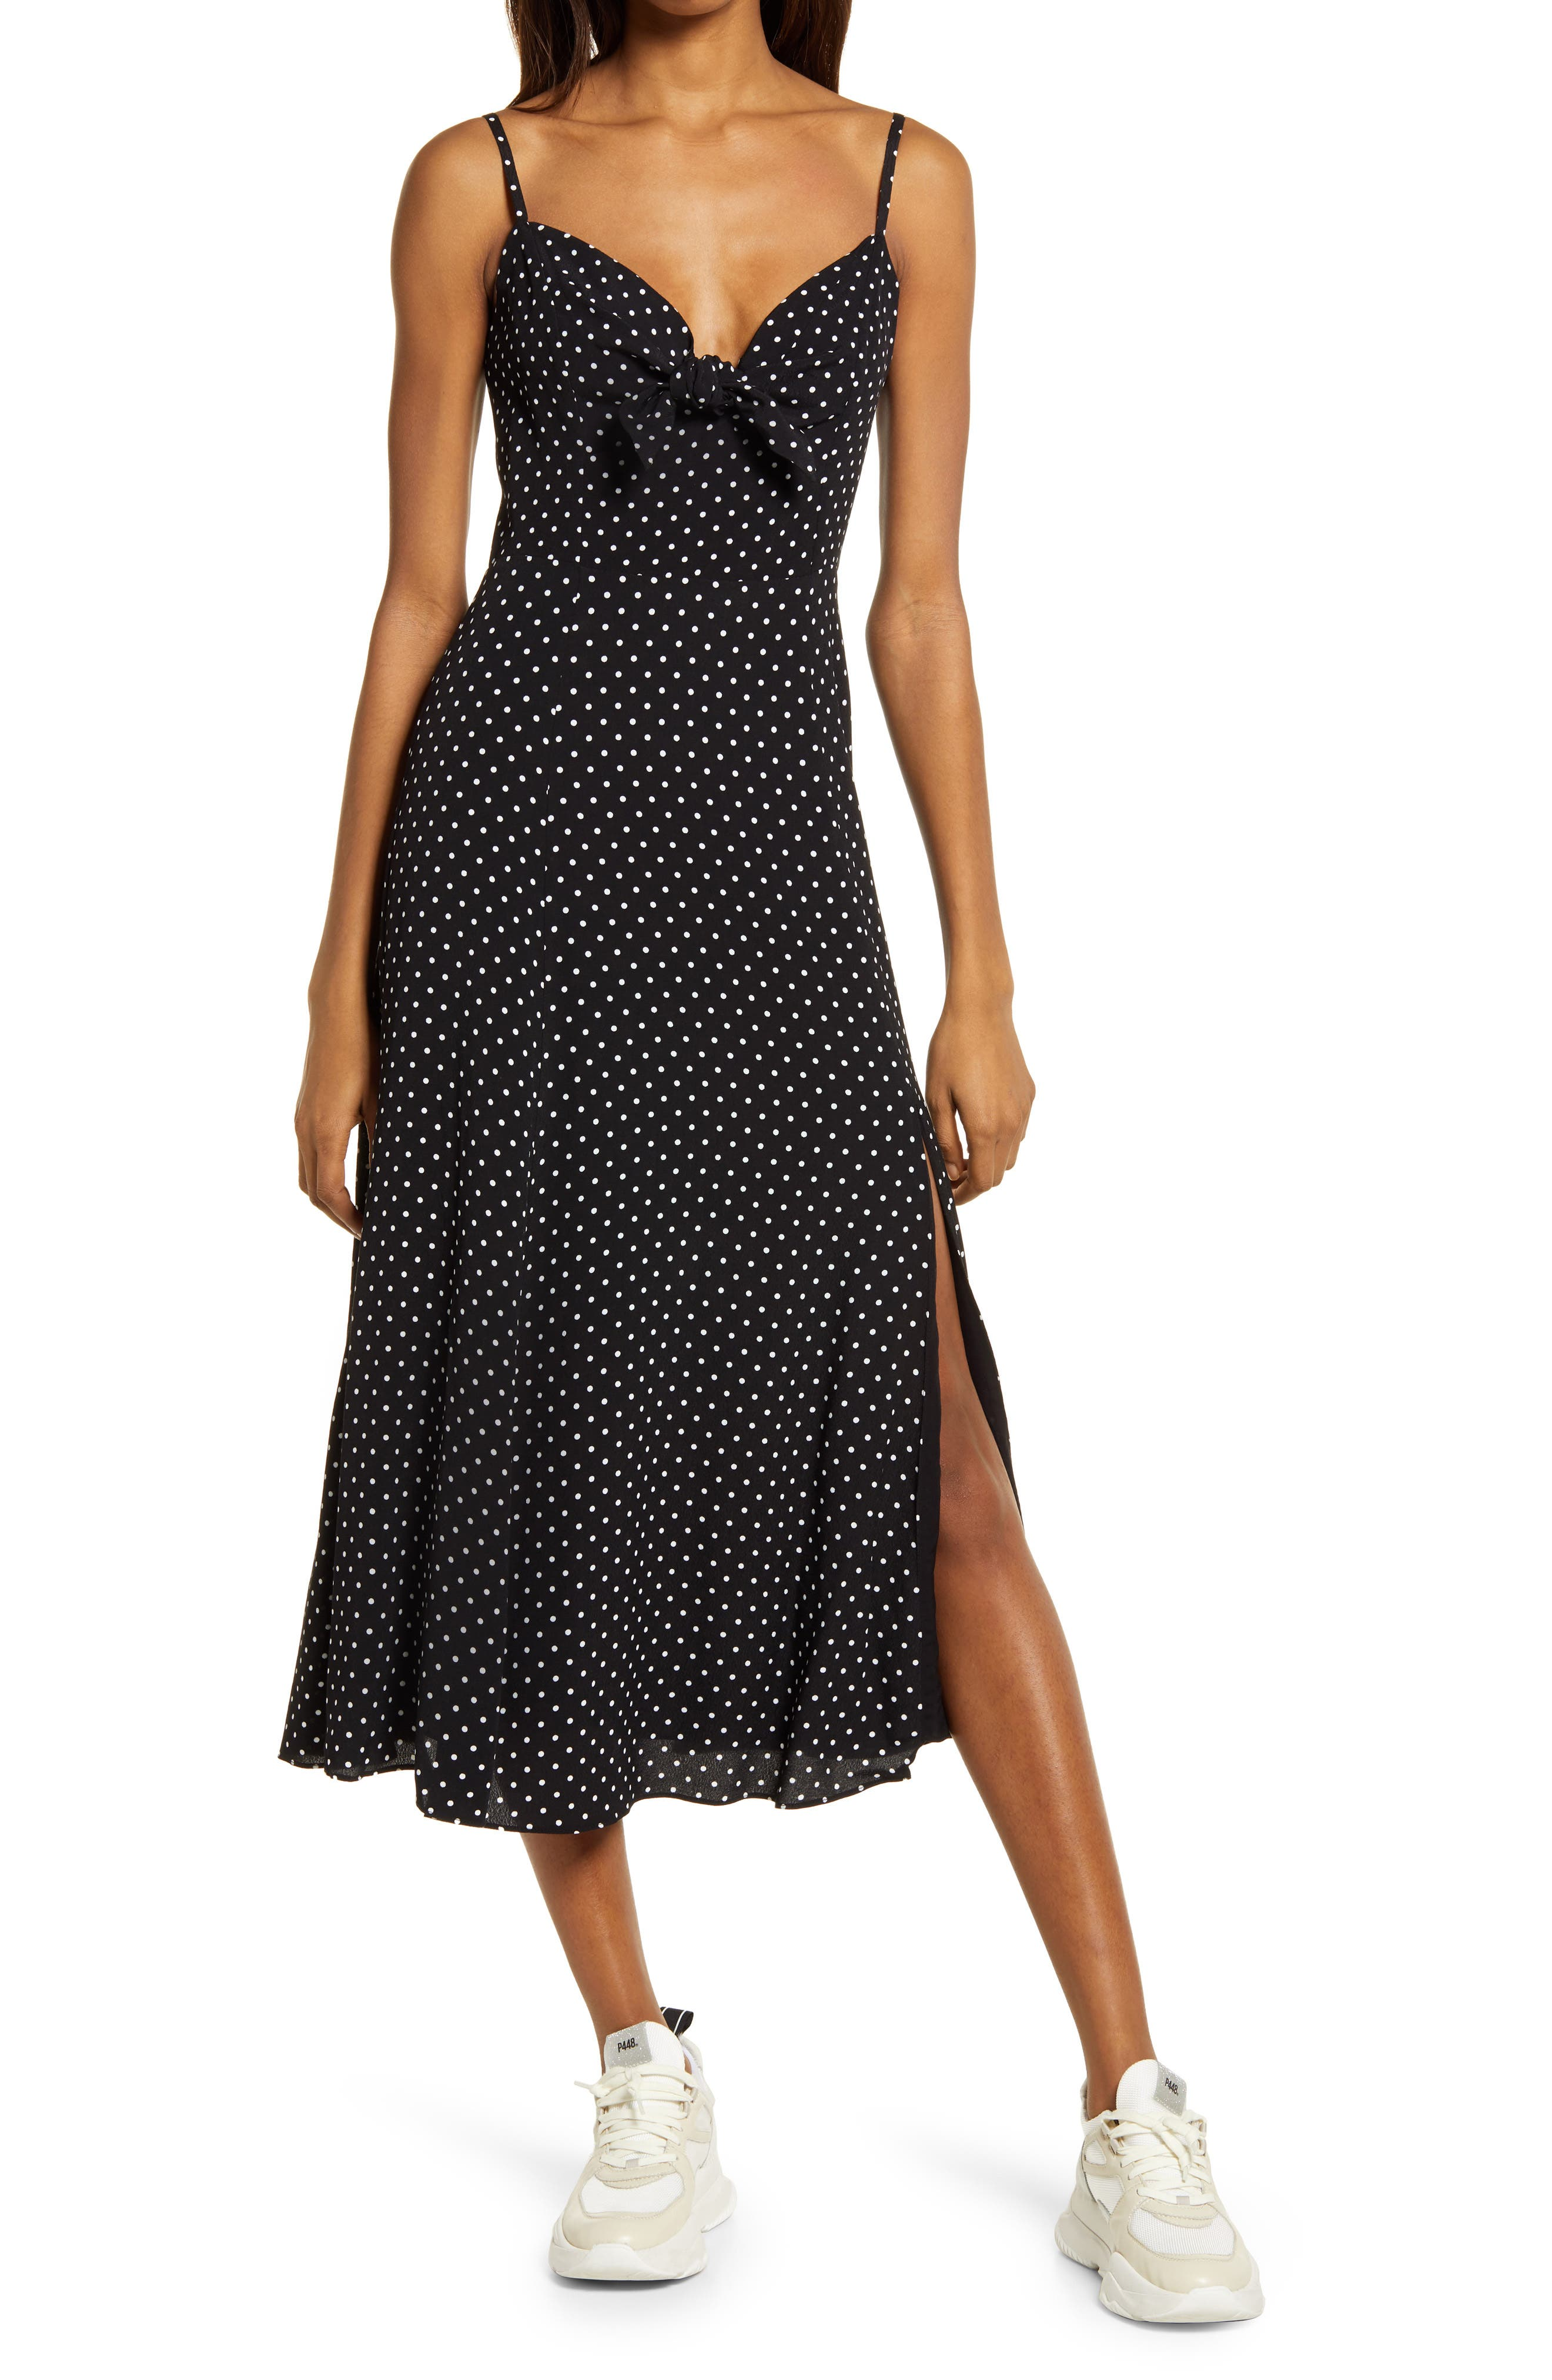 Clementine Polka Dot Tie Front Midi Dress